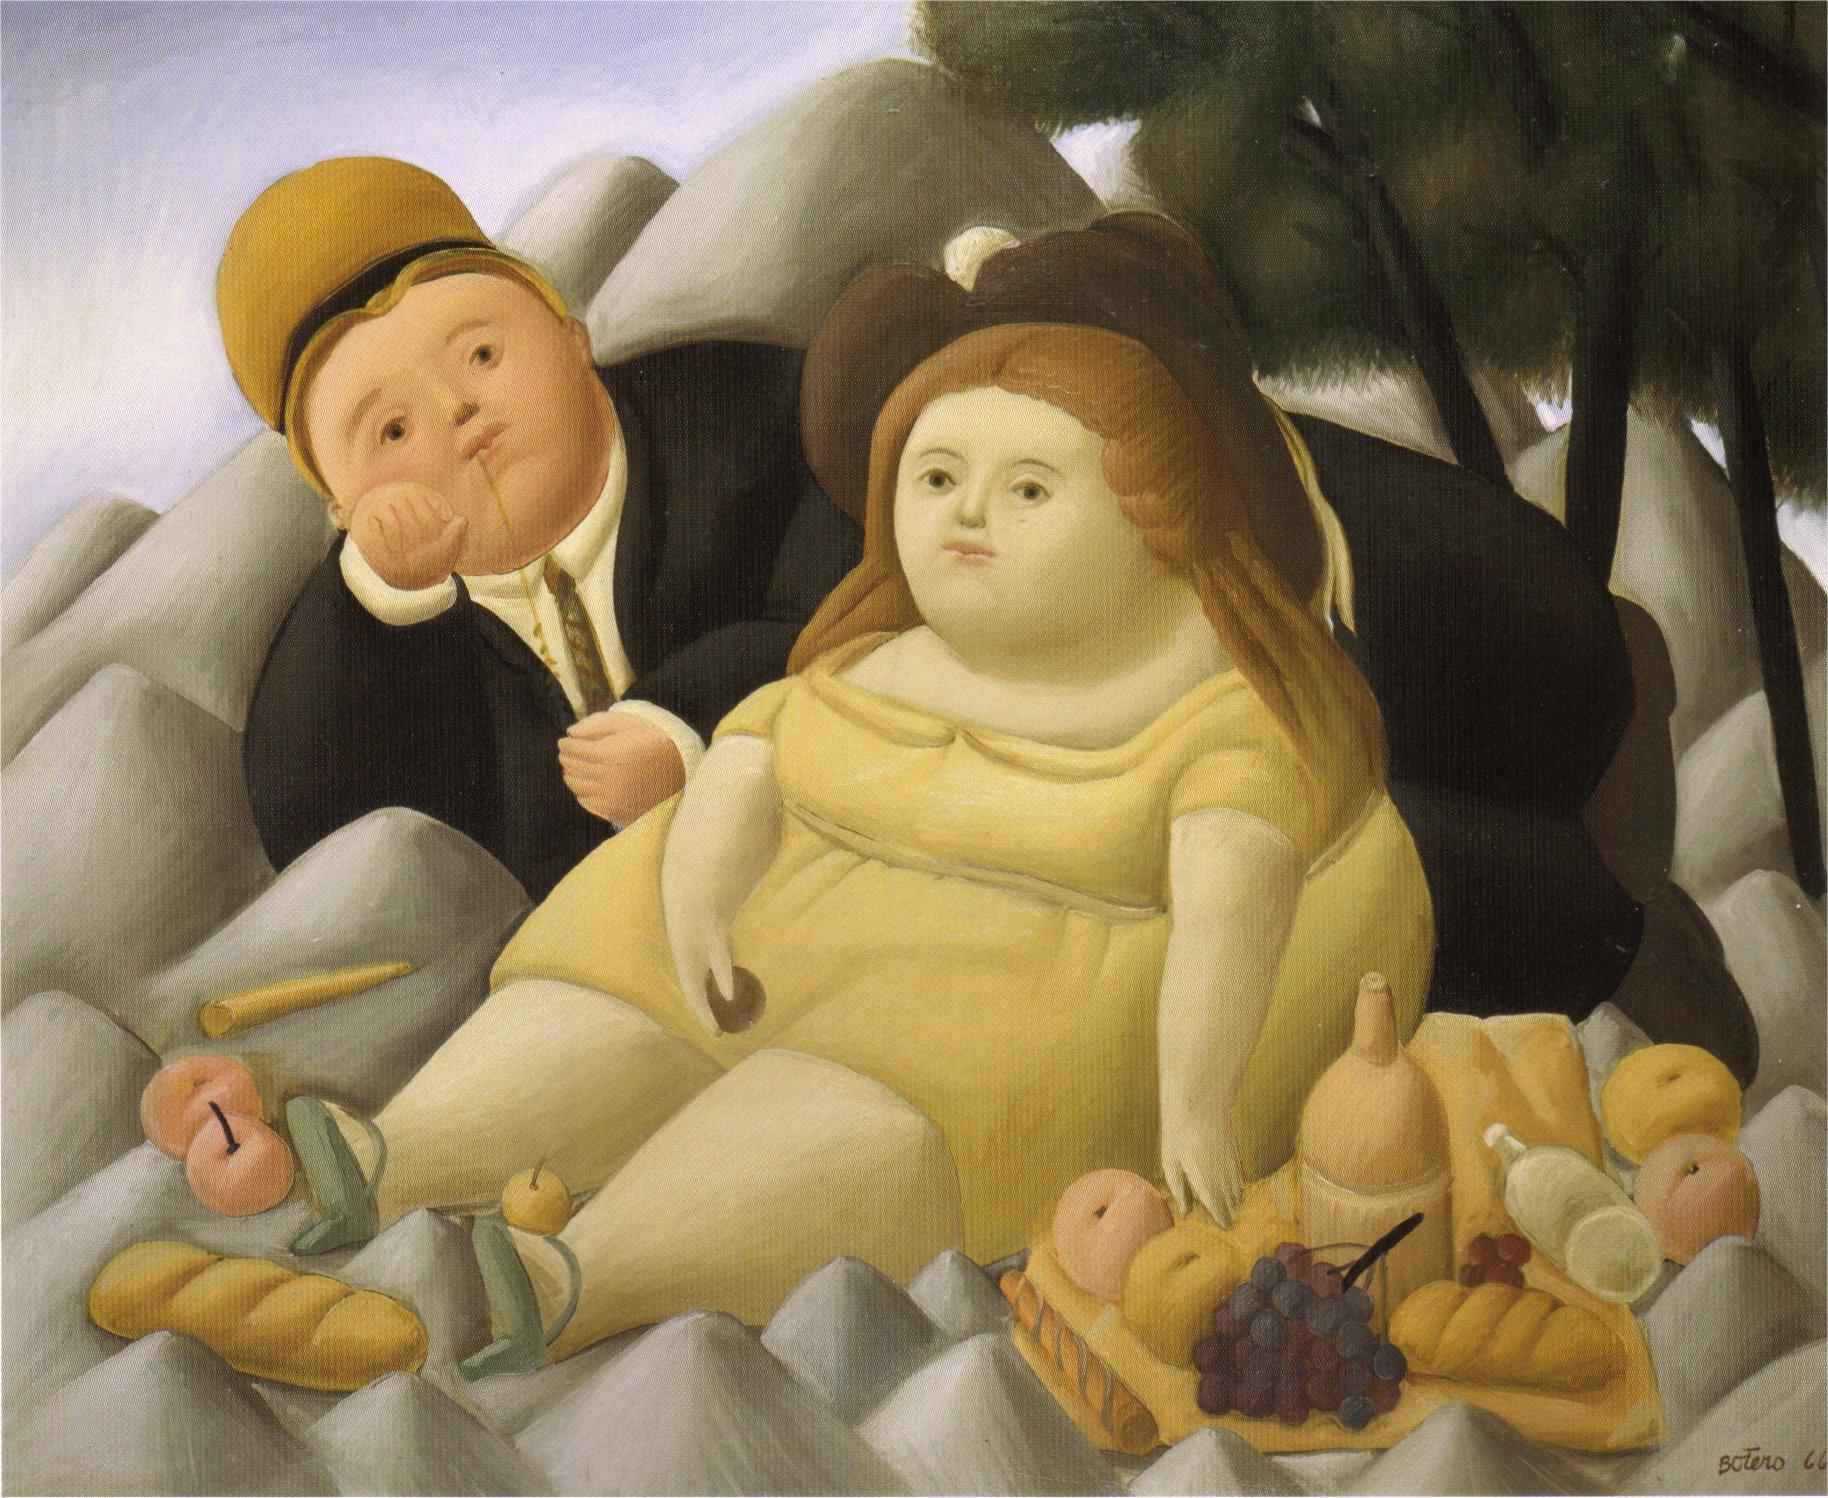 Bien-aimé Picnic in the Mountains, 1966 - Fernando Botero - WikiArt.org JL45